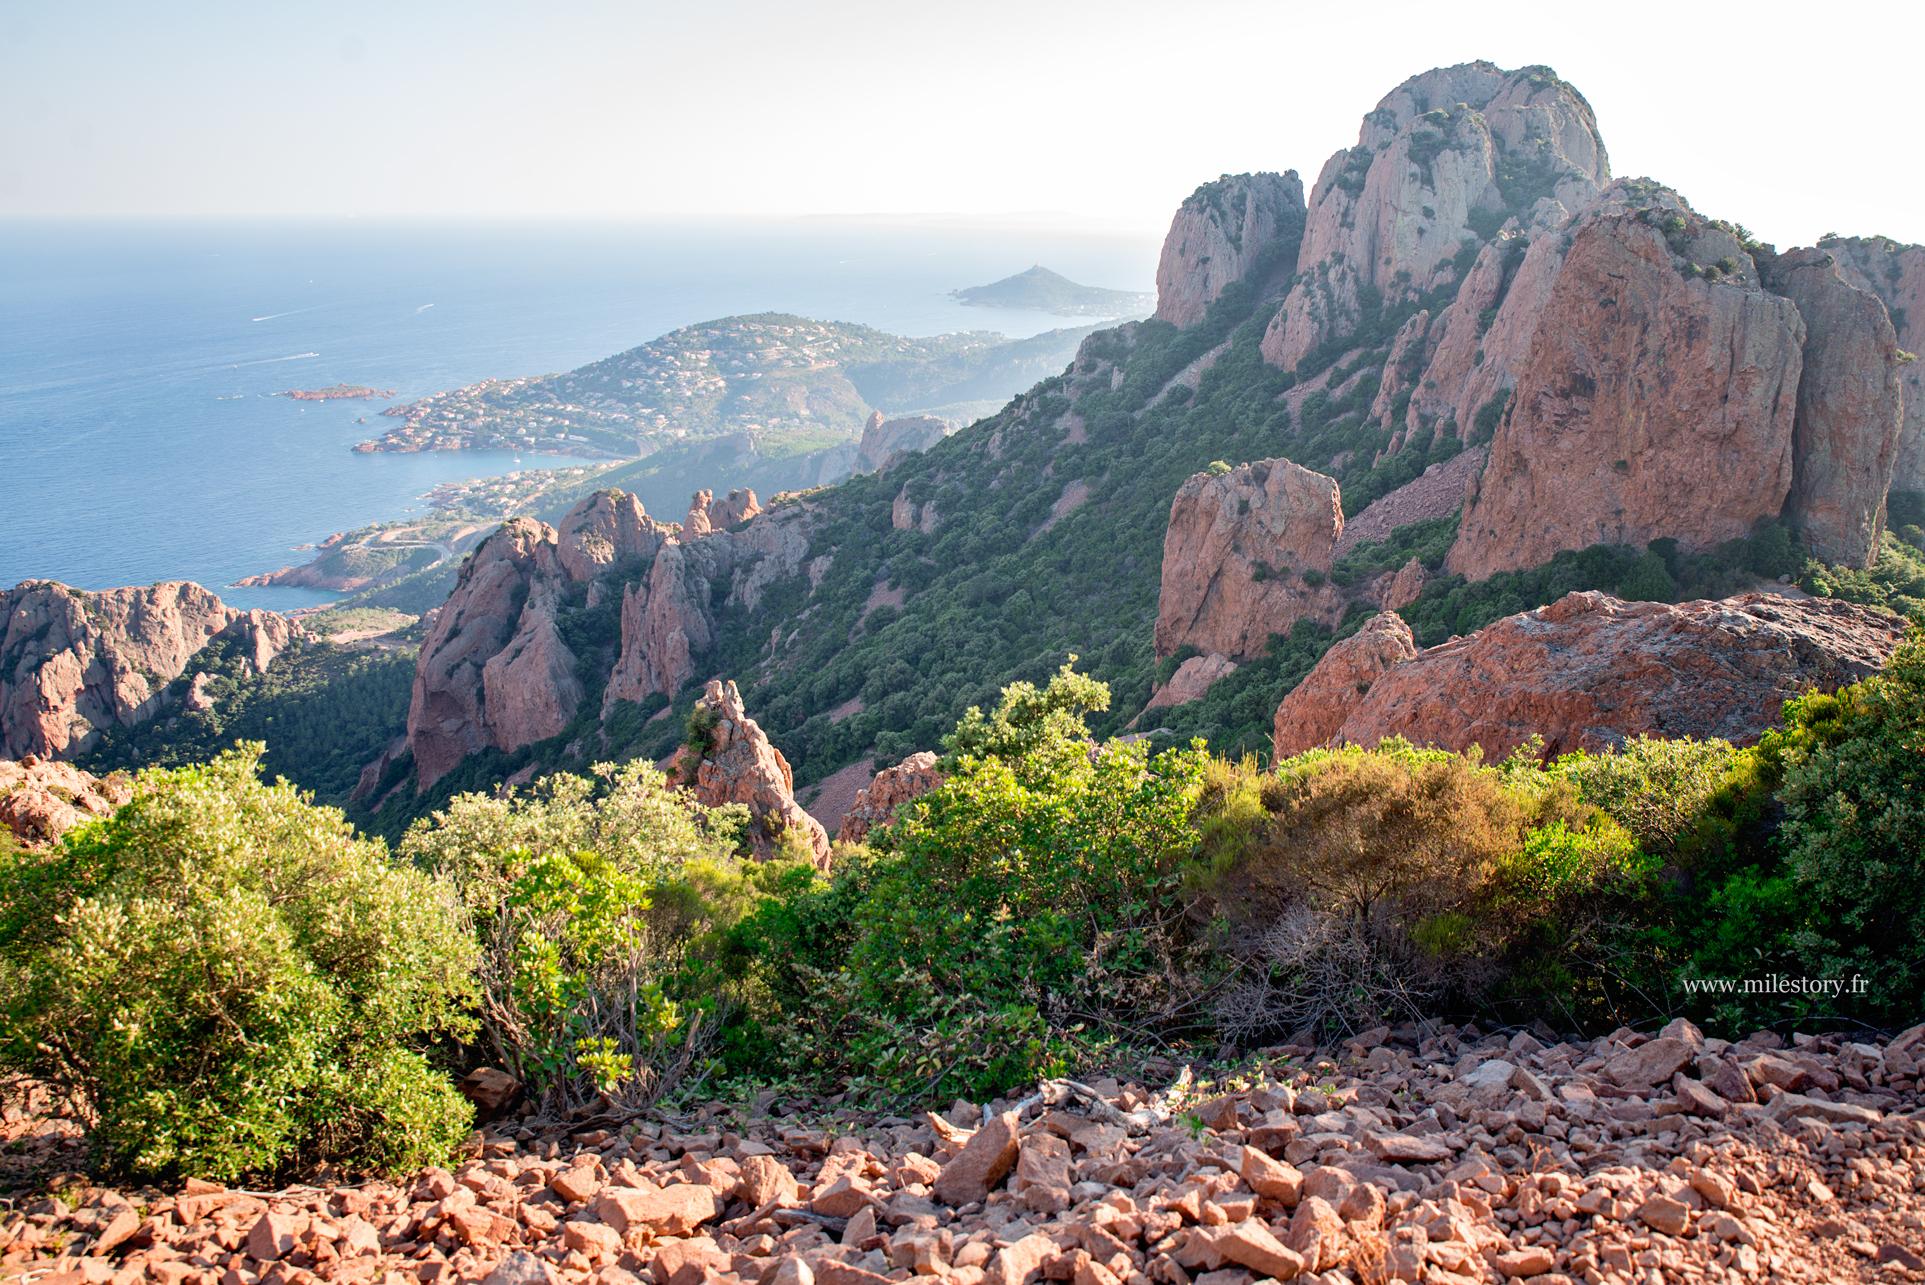 vue panorama sur Saint-Raphaël